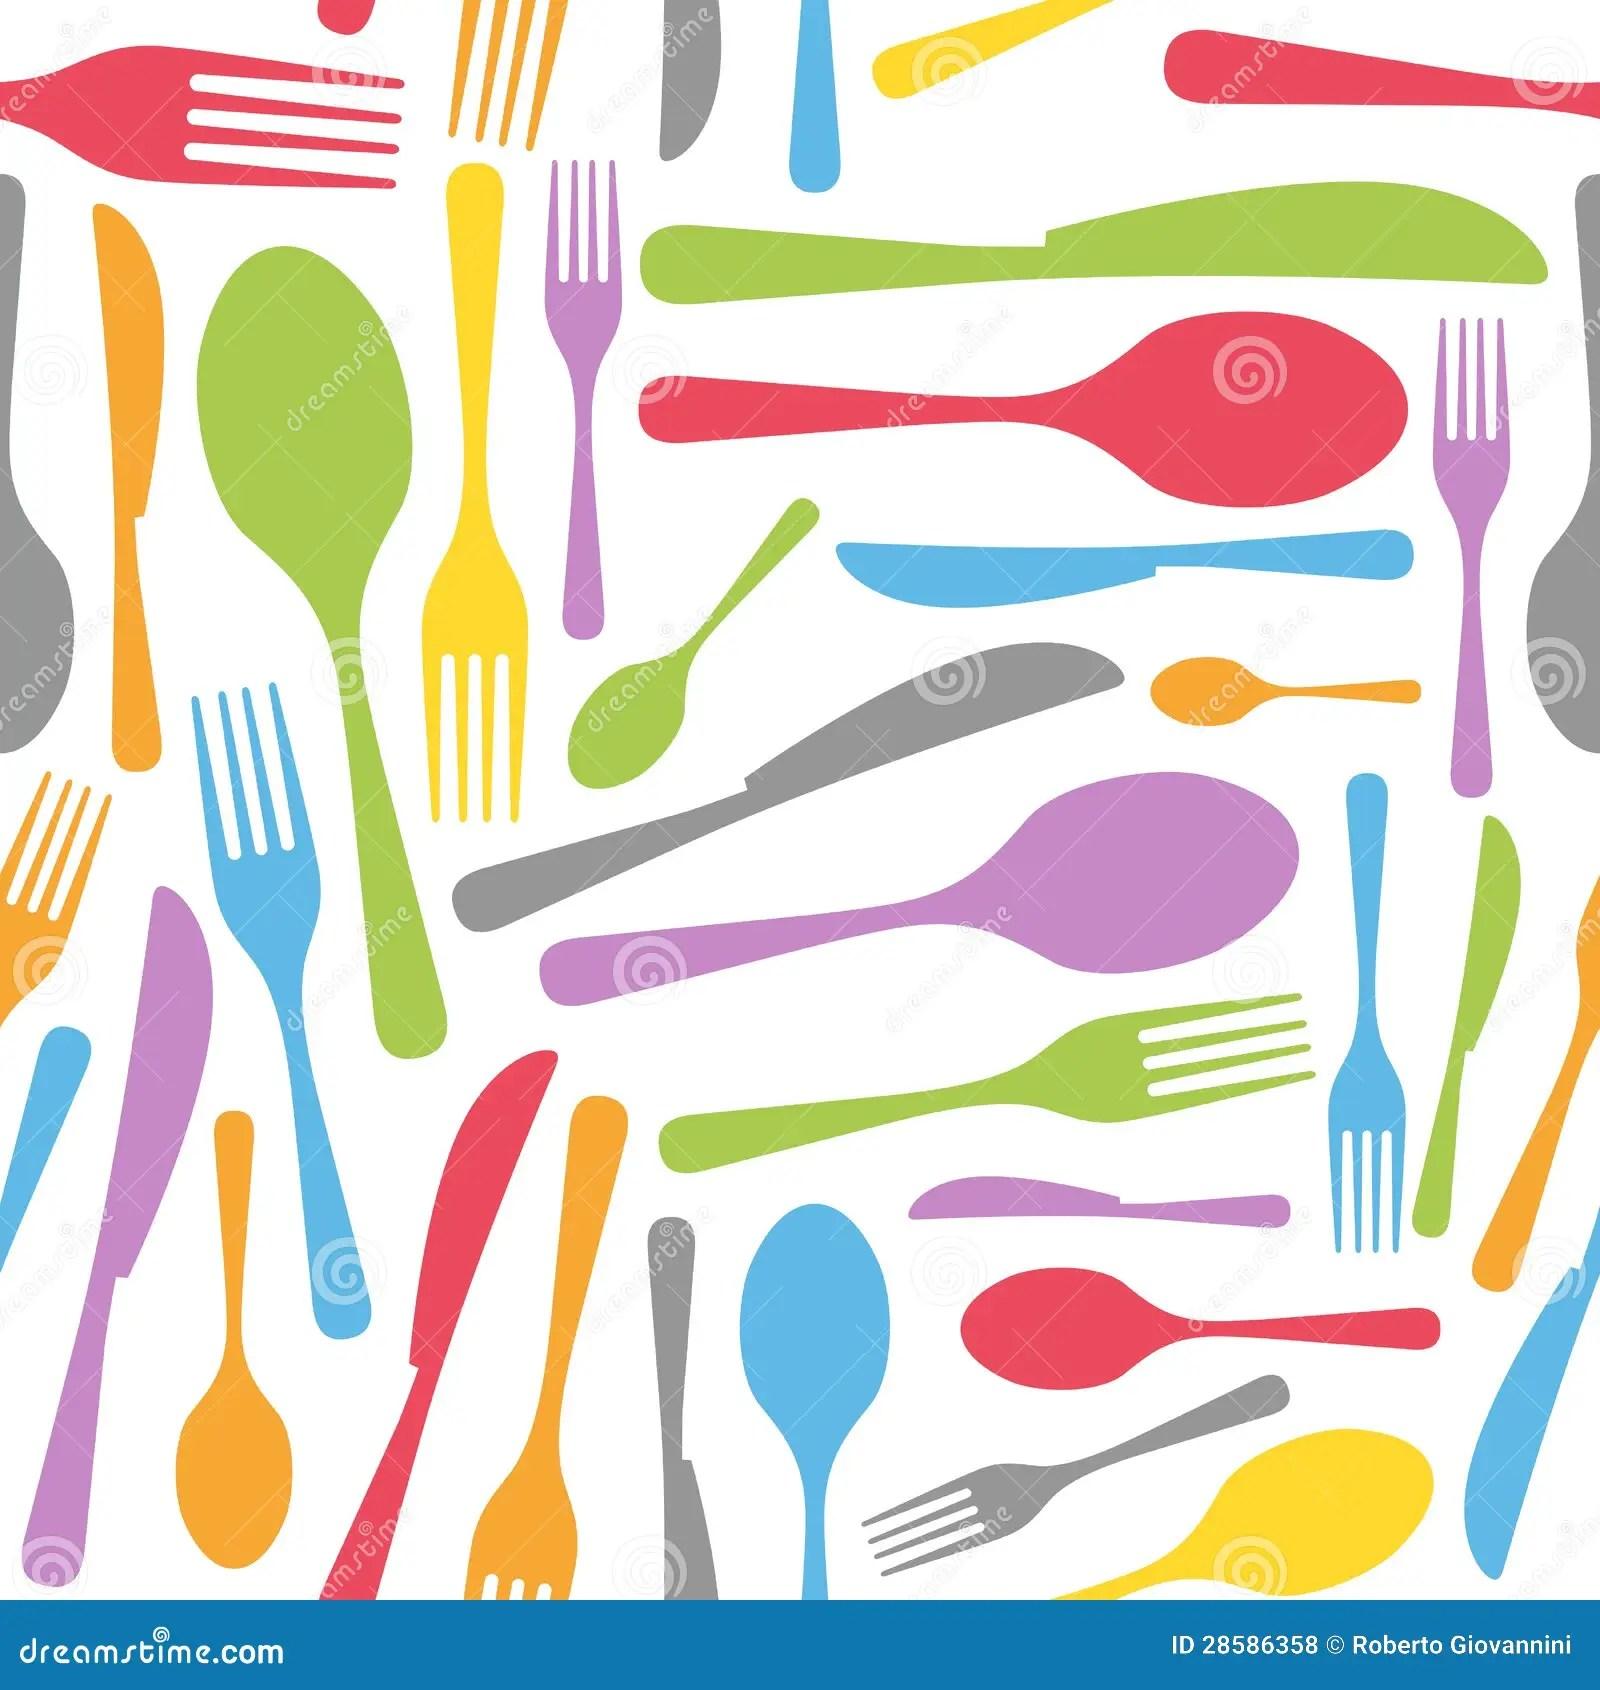 3d White Brick Wallpaper Cutlery Seamless Pattern Royalty Free Stock Photos Image